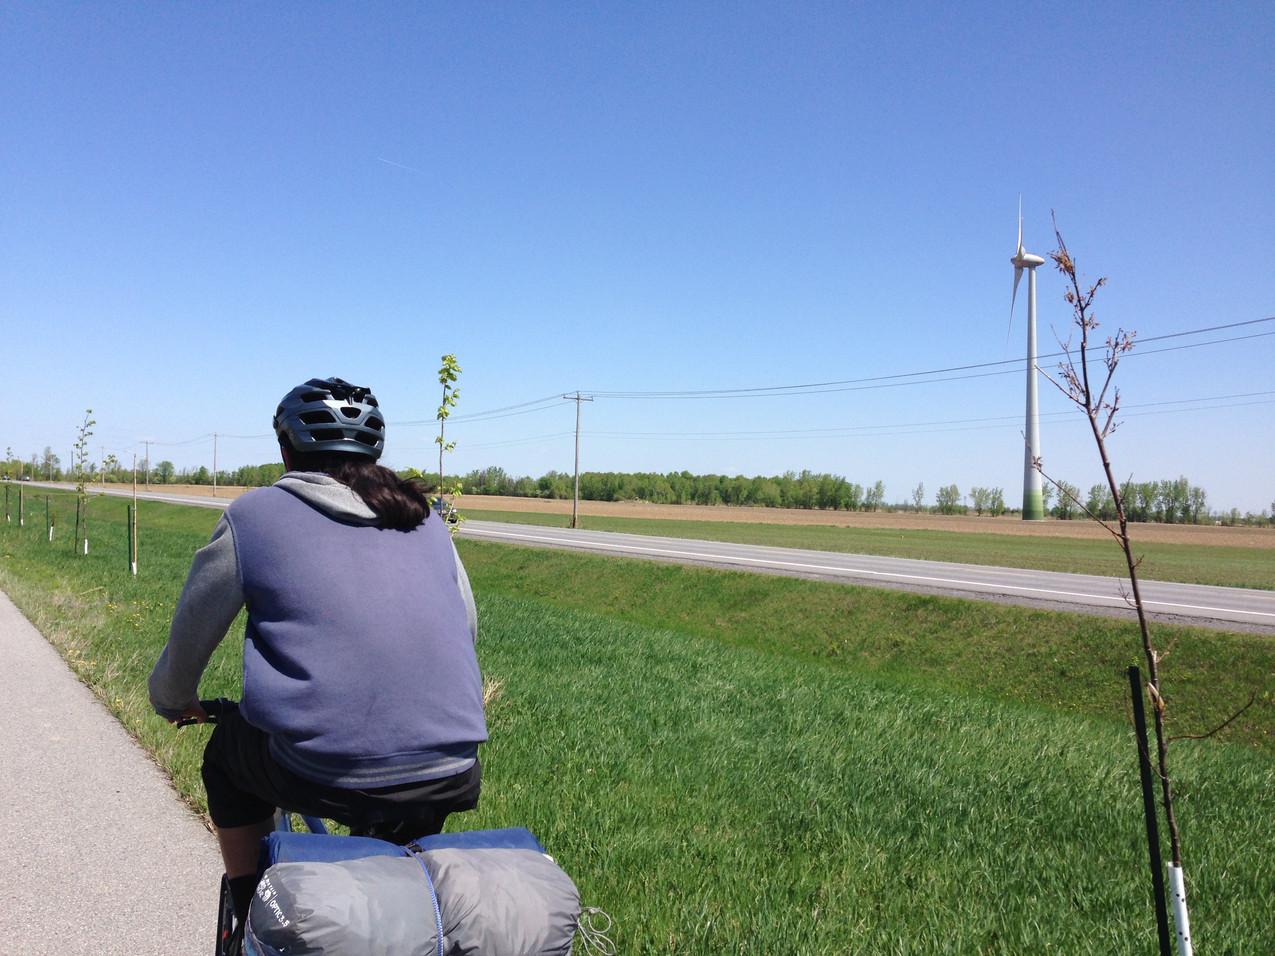 TWV Bike Trip - On the way to Ste Catherine!